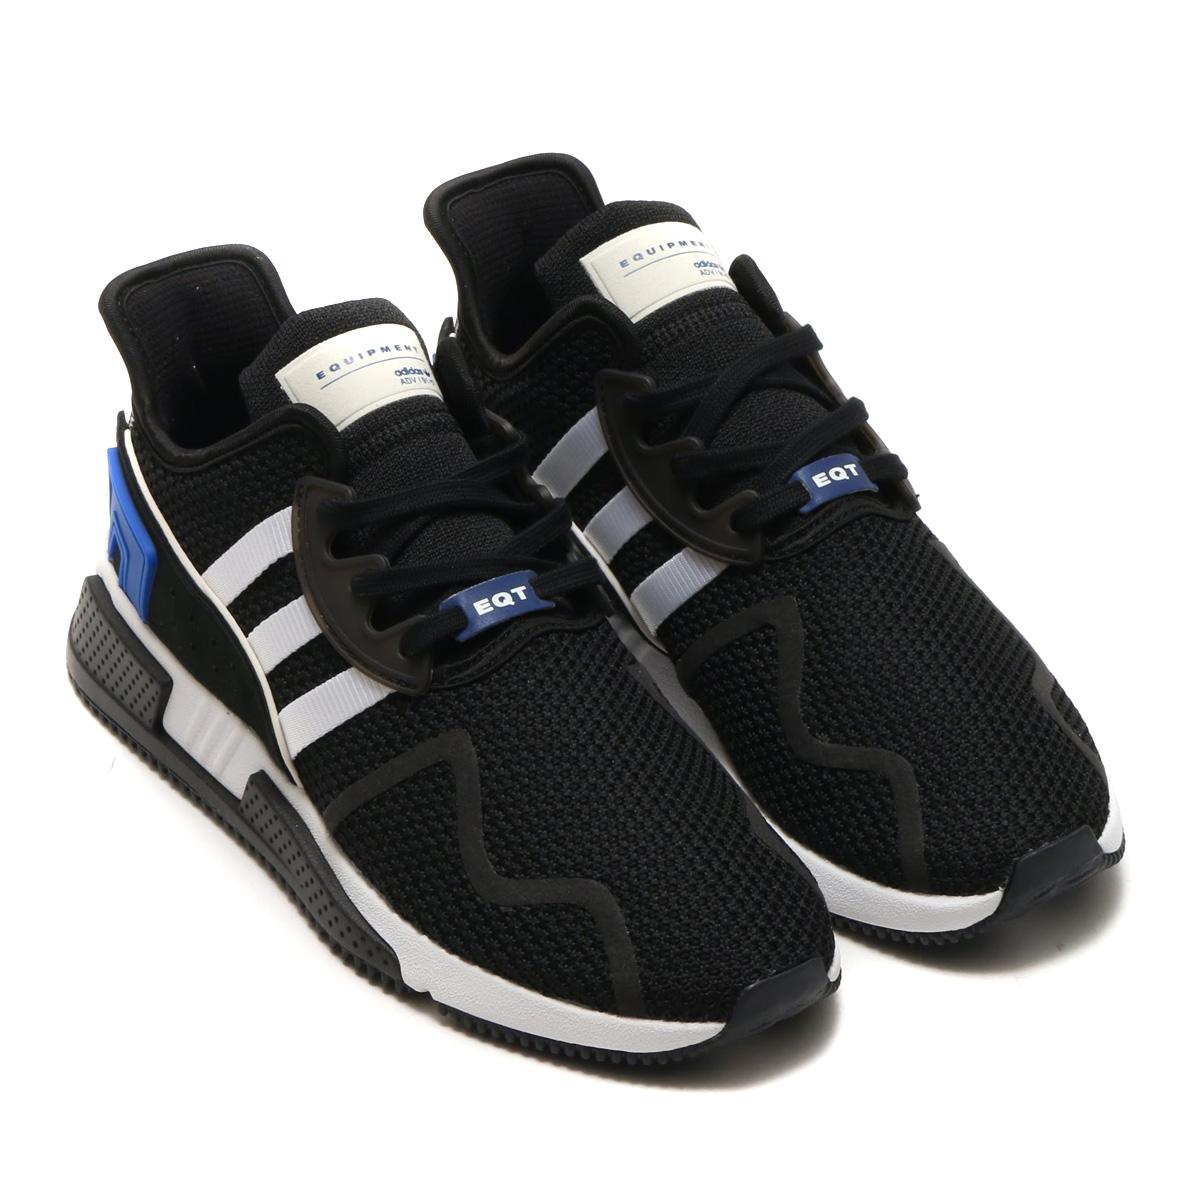 adidas Originals EQT CUSHION ADV(アディダス オリジナルス イーキューティー クッション ADV)CoreBlack/RunningWhite/CollegiateRoyal17FW-I